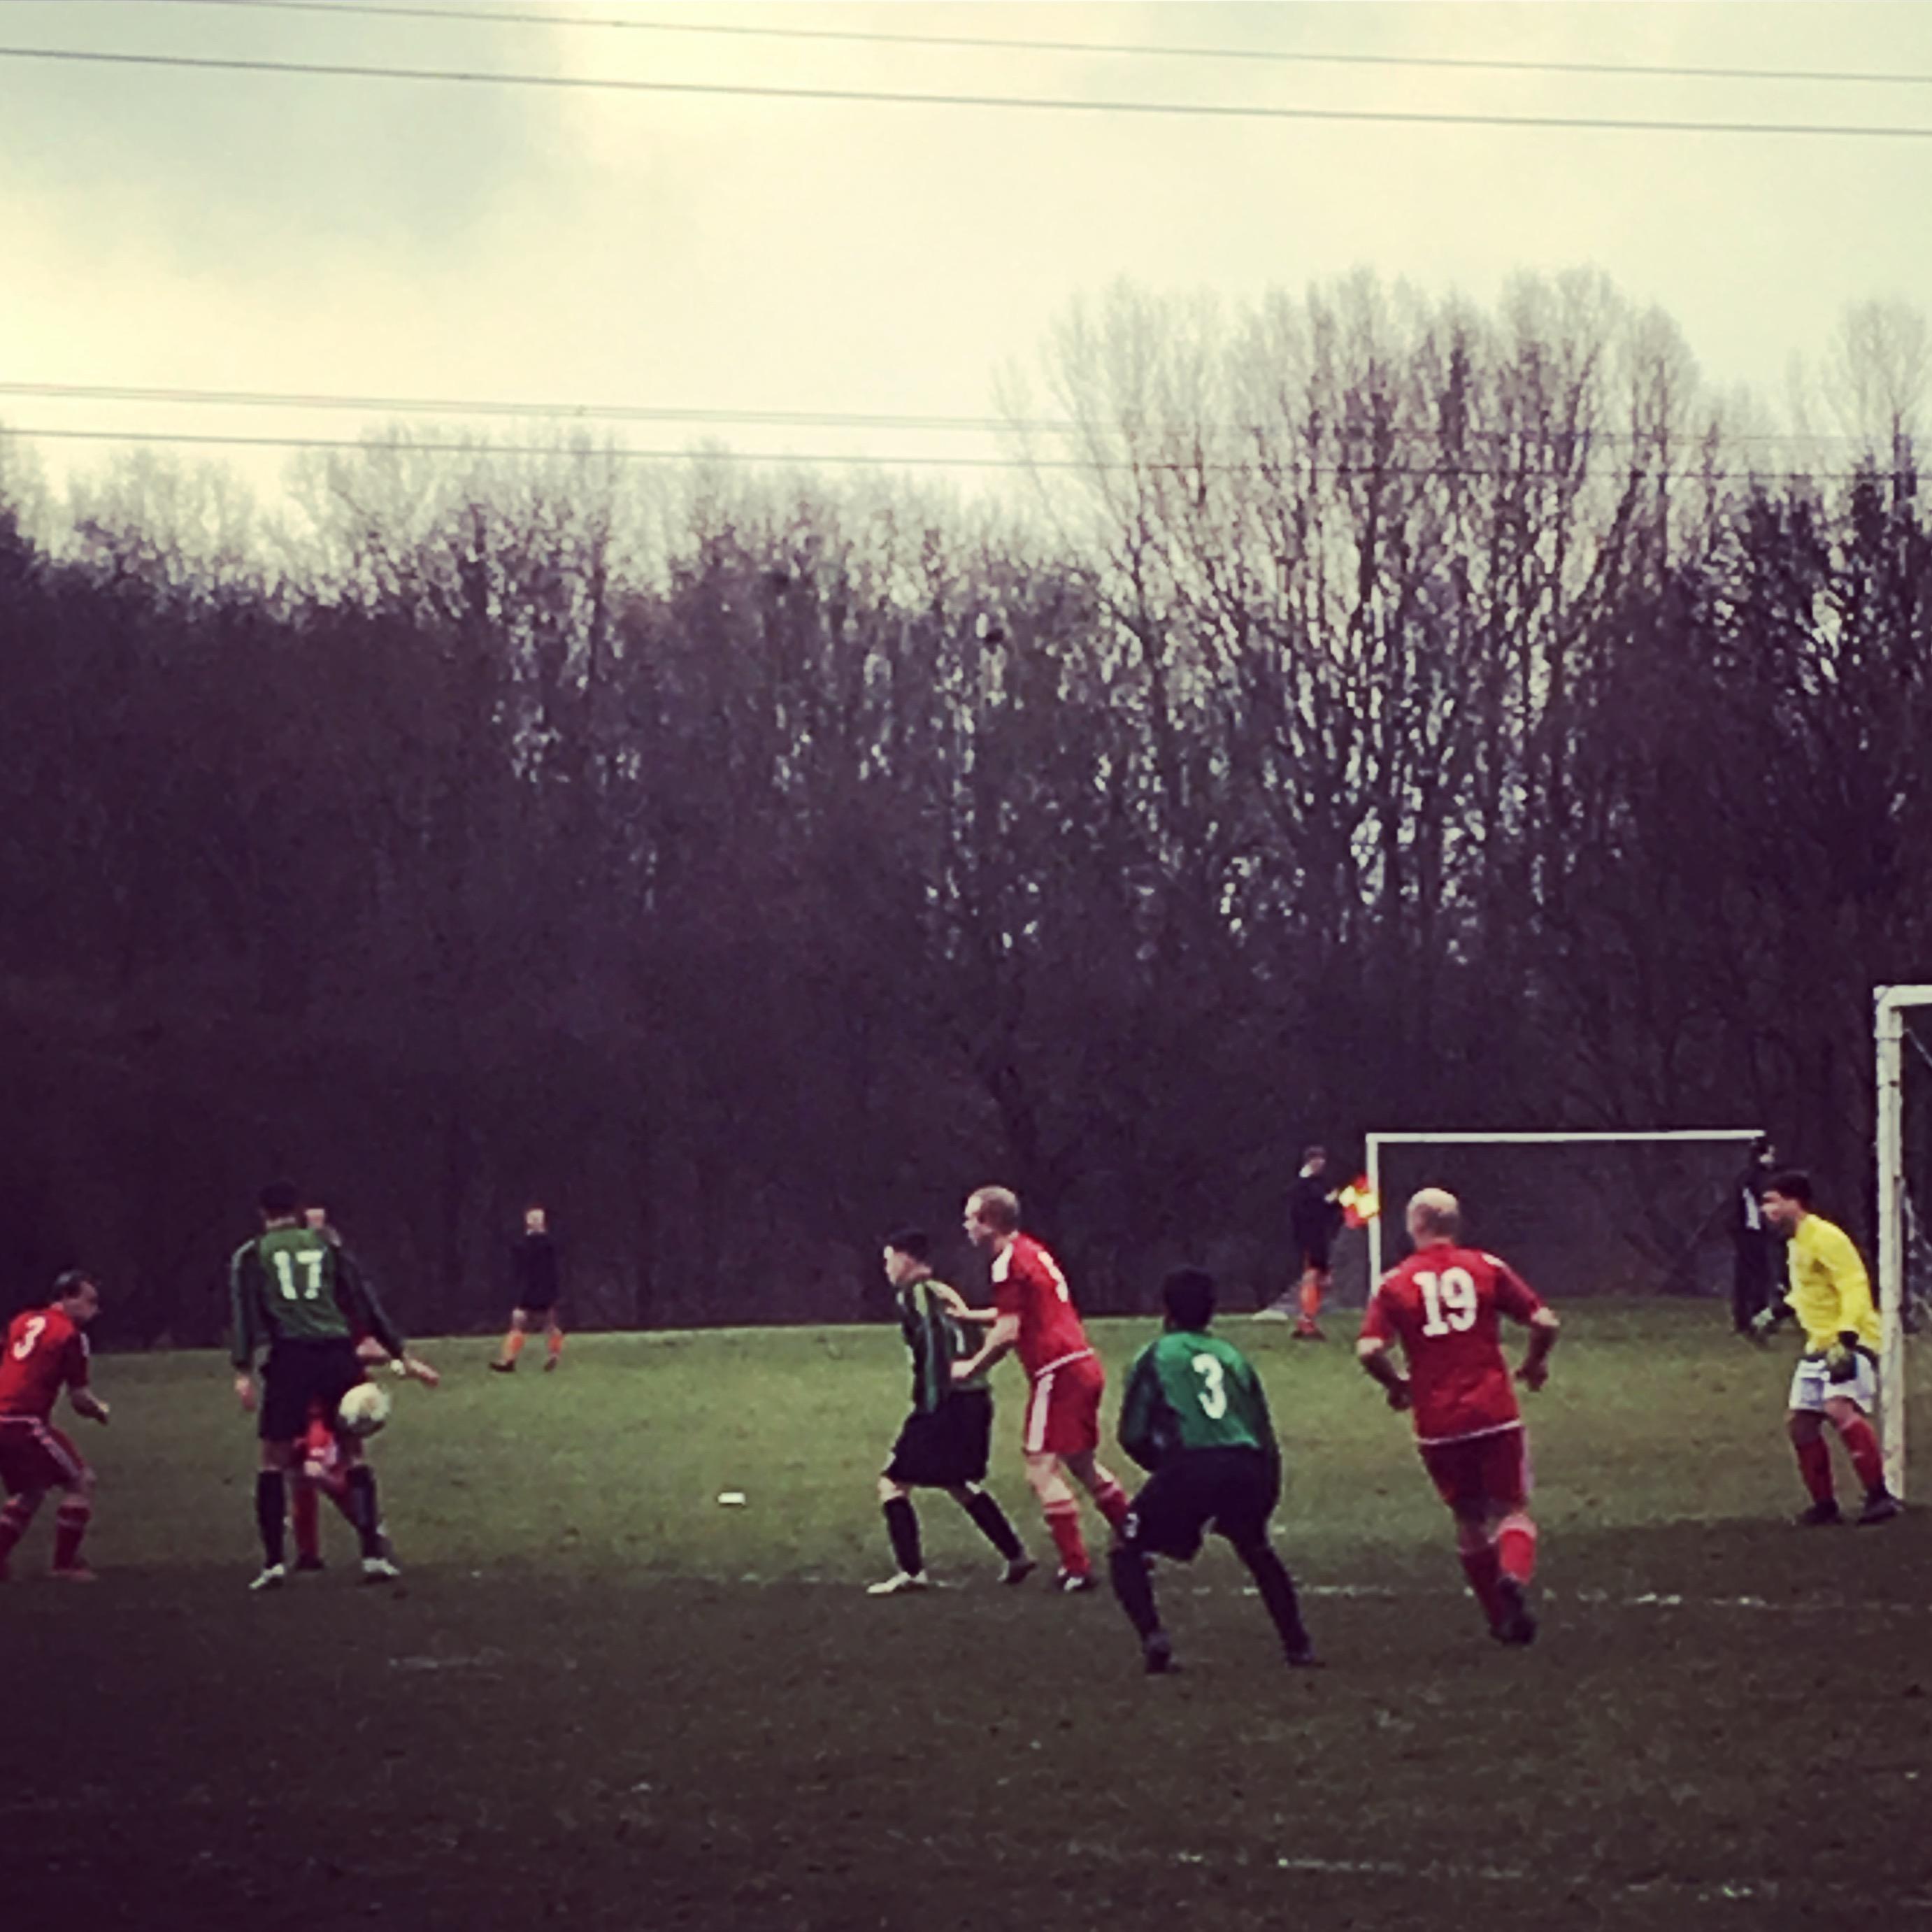 Village Manchester Football Club Feb 2017  (36).JPG